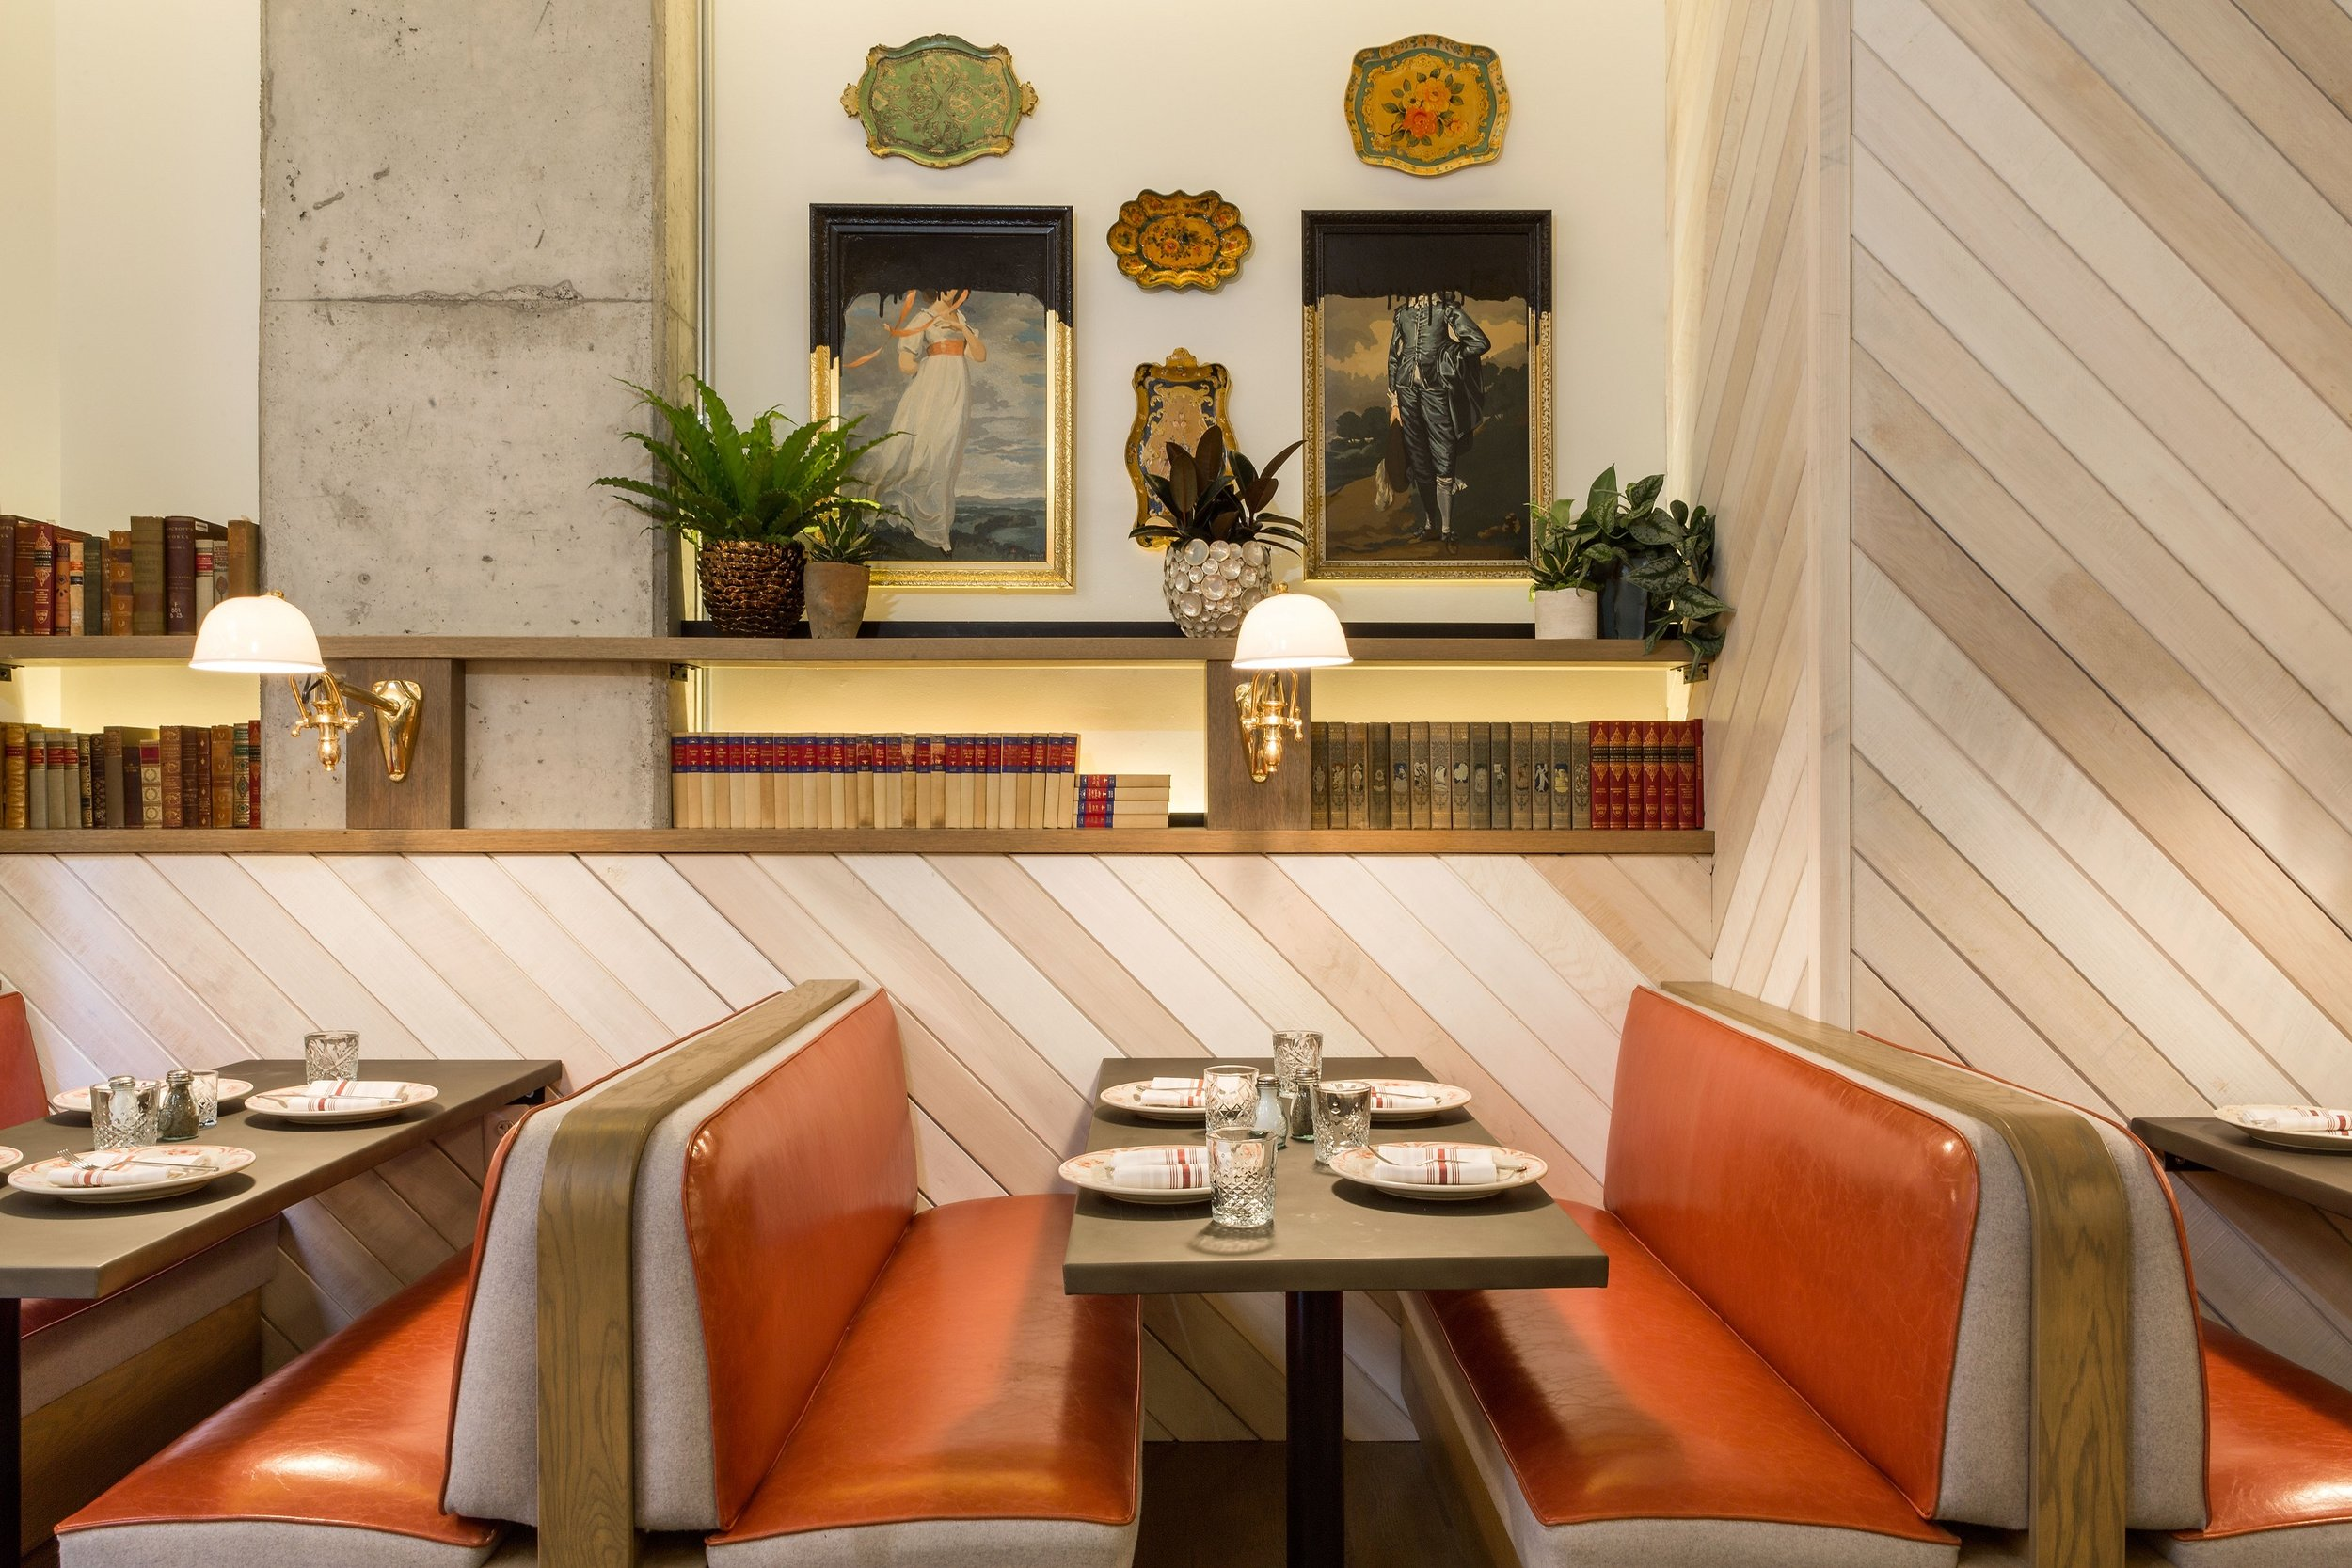 studio-saint-hotels-pod-hotel-crimson-diner-washington-dc-1